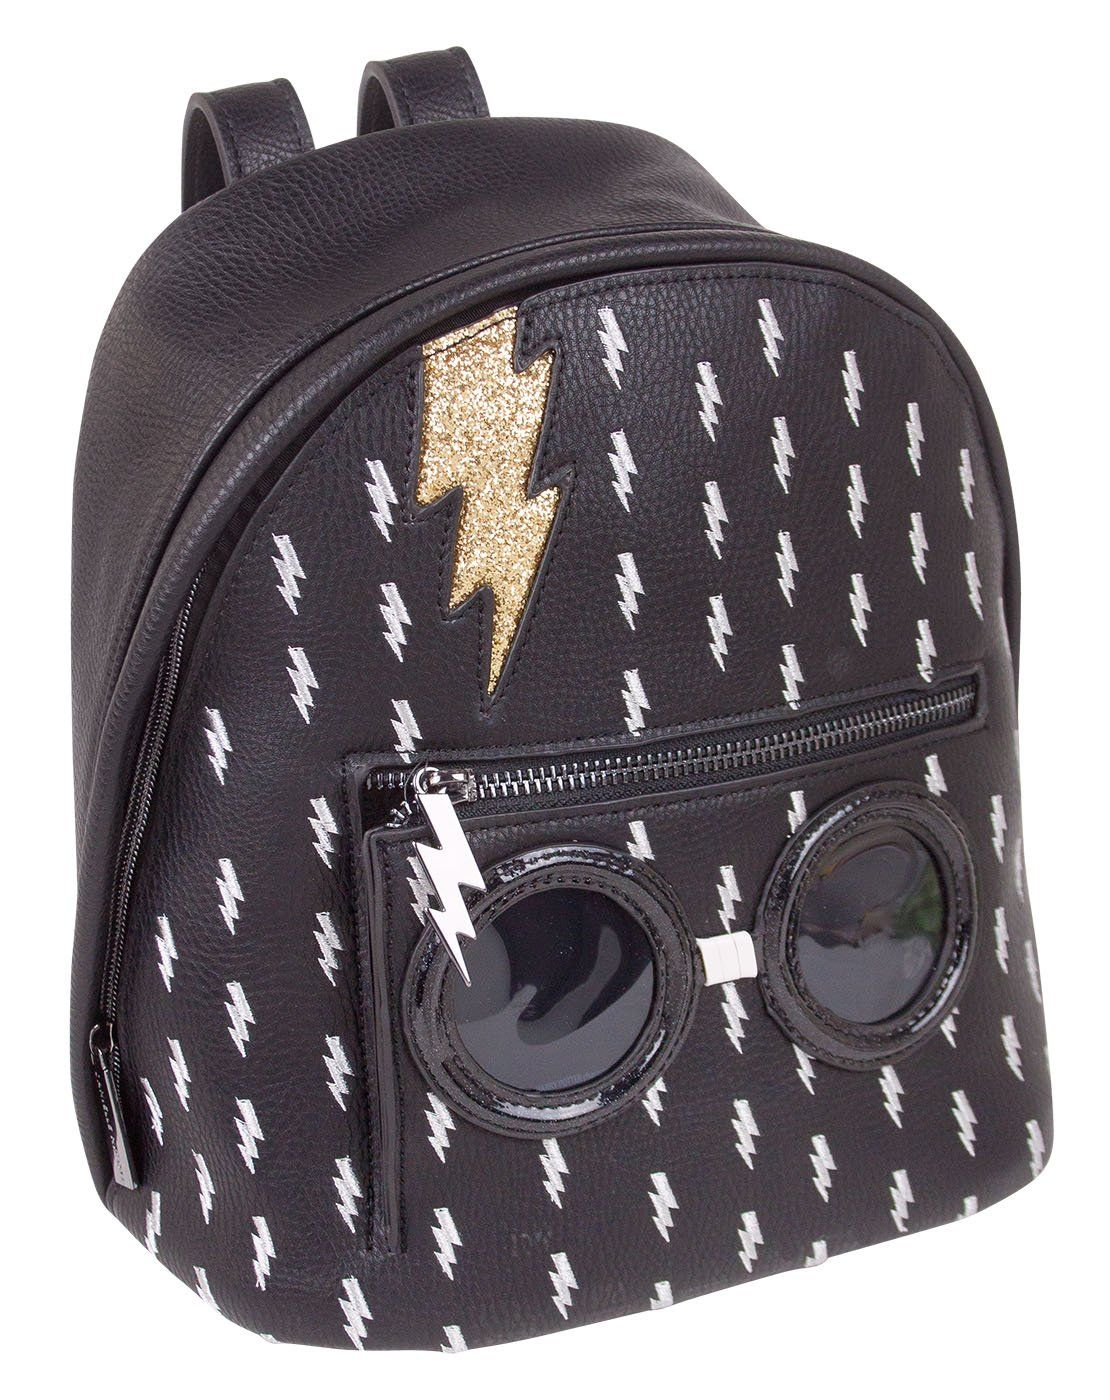 Danielle Nicole Harry Potter Bolt Backpack